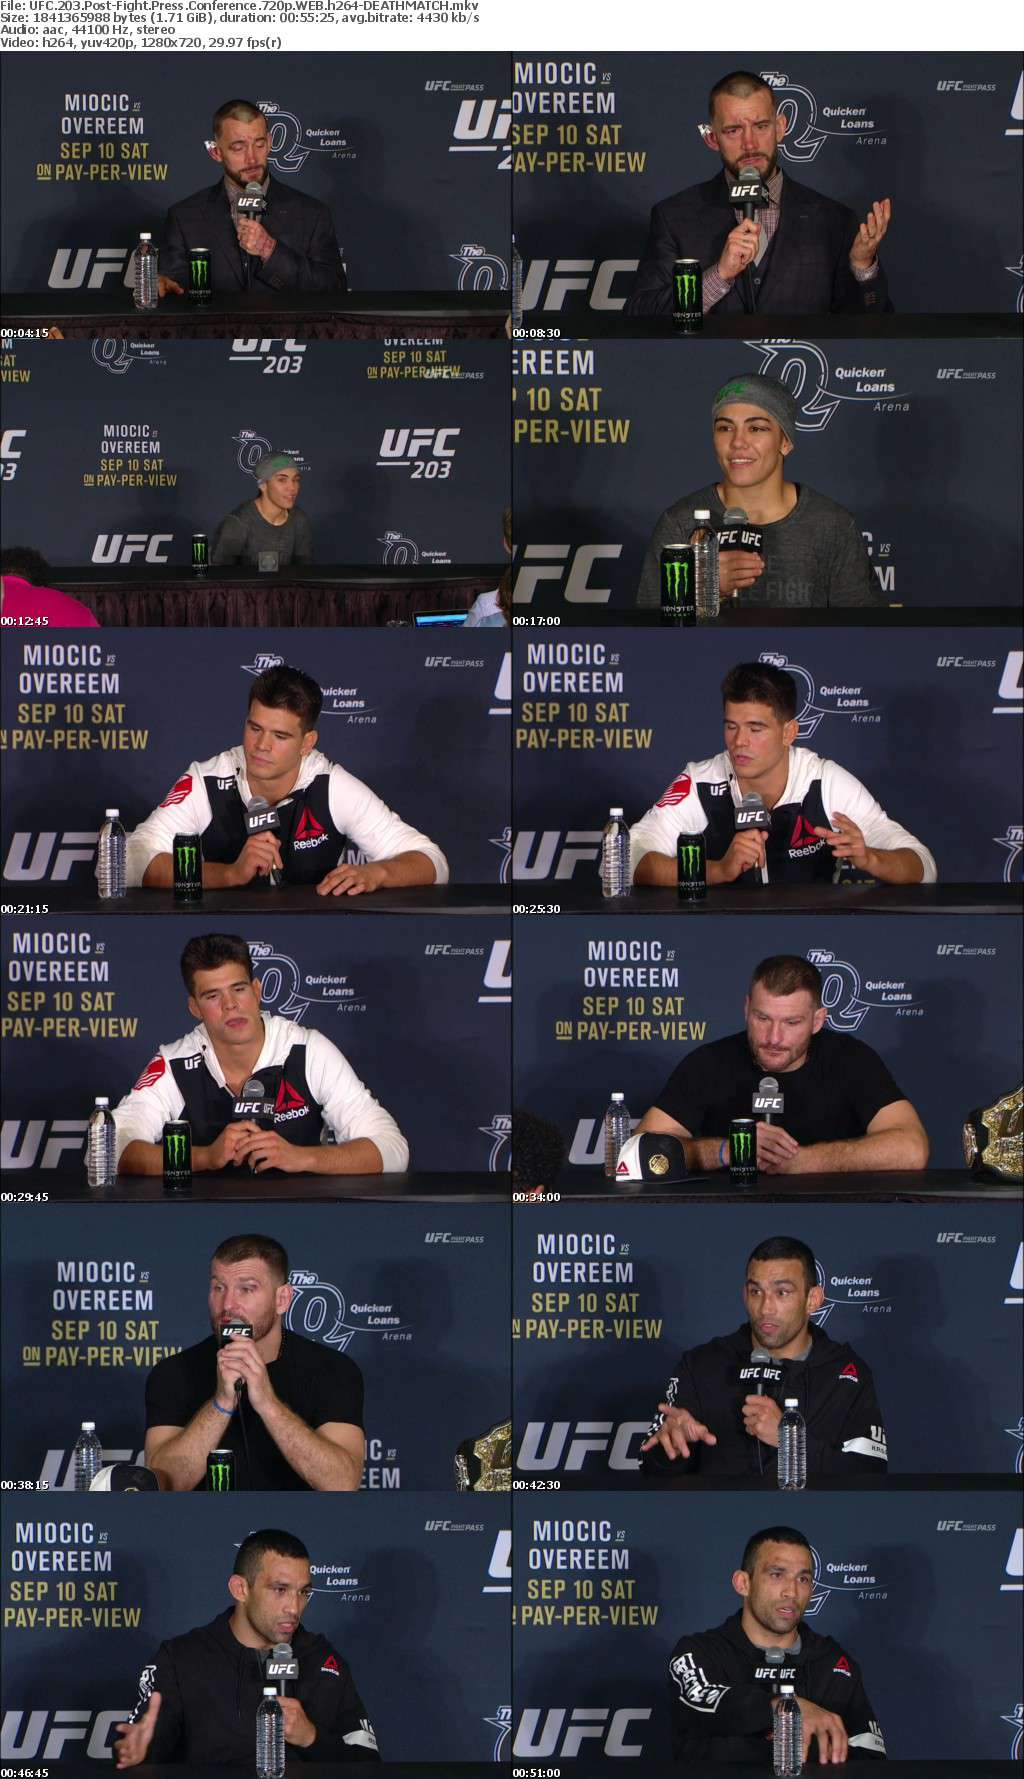 UFC 203 Post-Fight Press Conference 720p WEB h264-DEATHMATCH